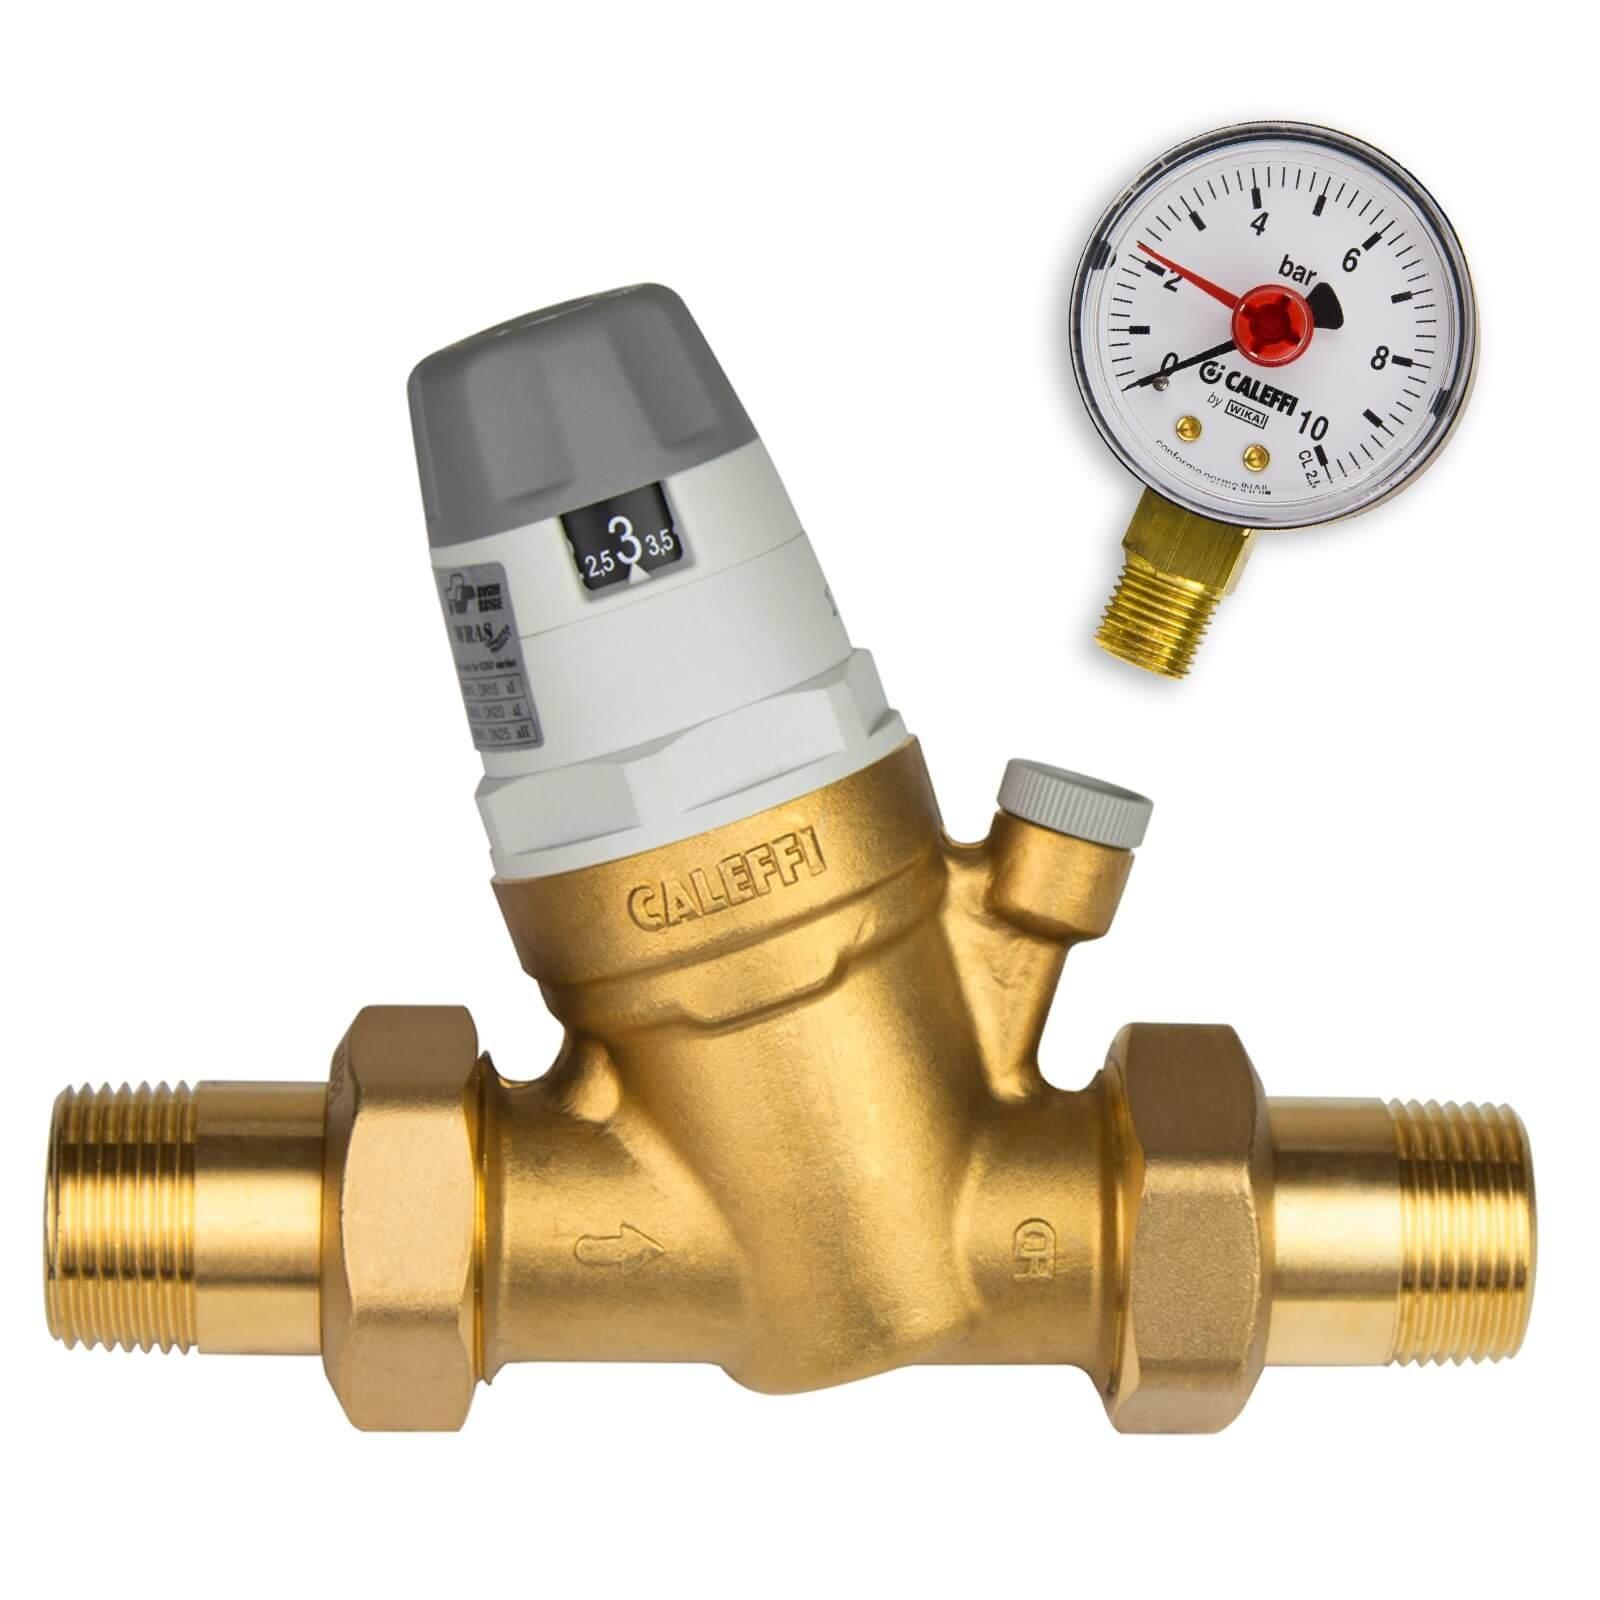 Caleffi Water Pressure Regulator 1/2 Inch DN15 Pressure Reducer for Water with Replaceable Cartridge and Pressure Gauge, Pressure Reducing Valve, Pressure Regulator 535041, Multi-Coloured